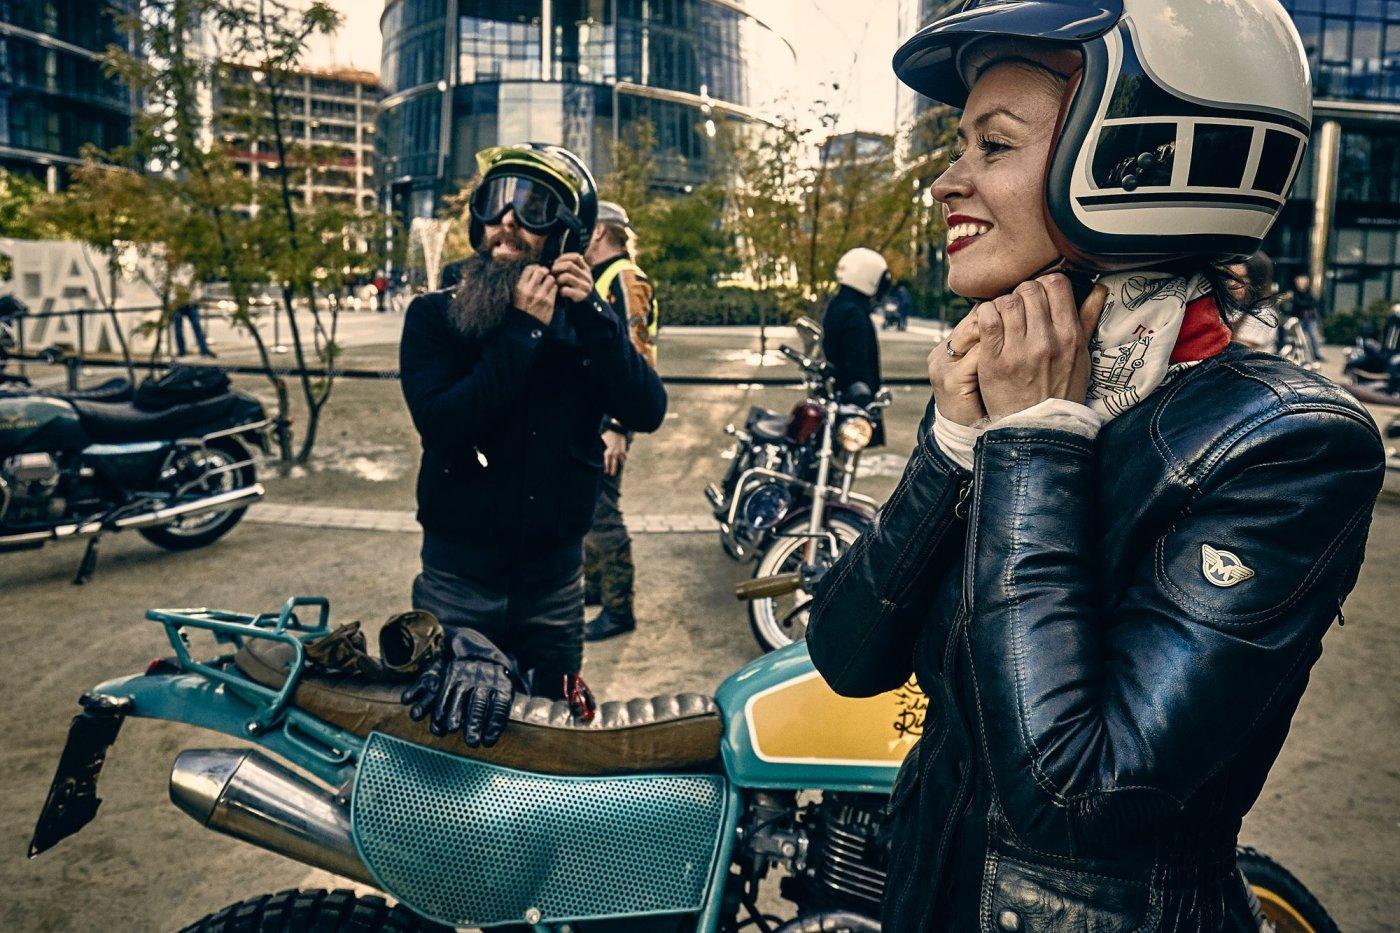 DGR 2019 Warszawa - foto Bartek Zaranek (20)